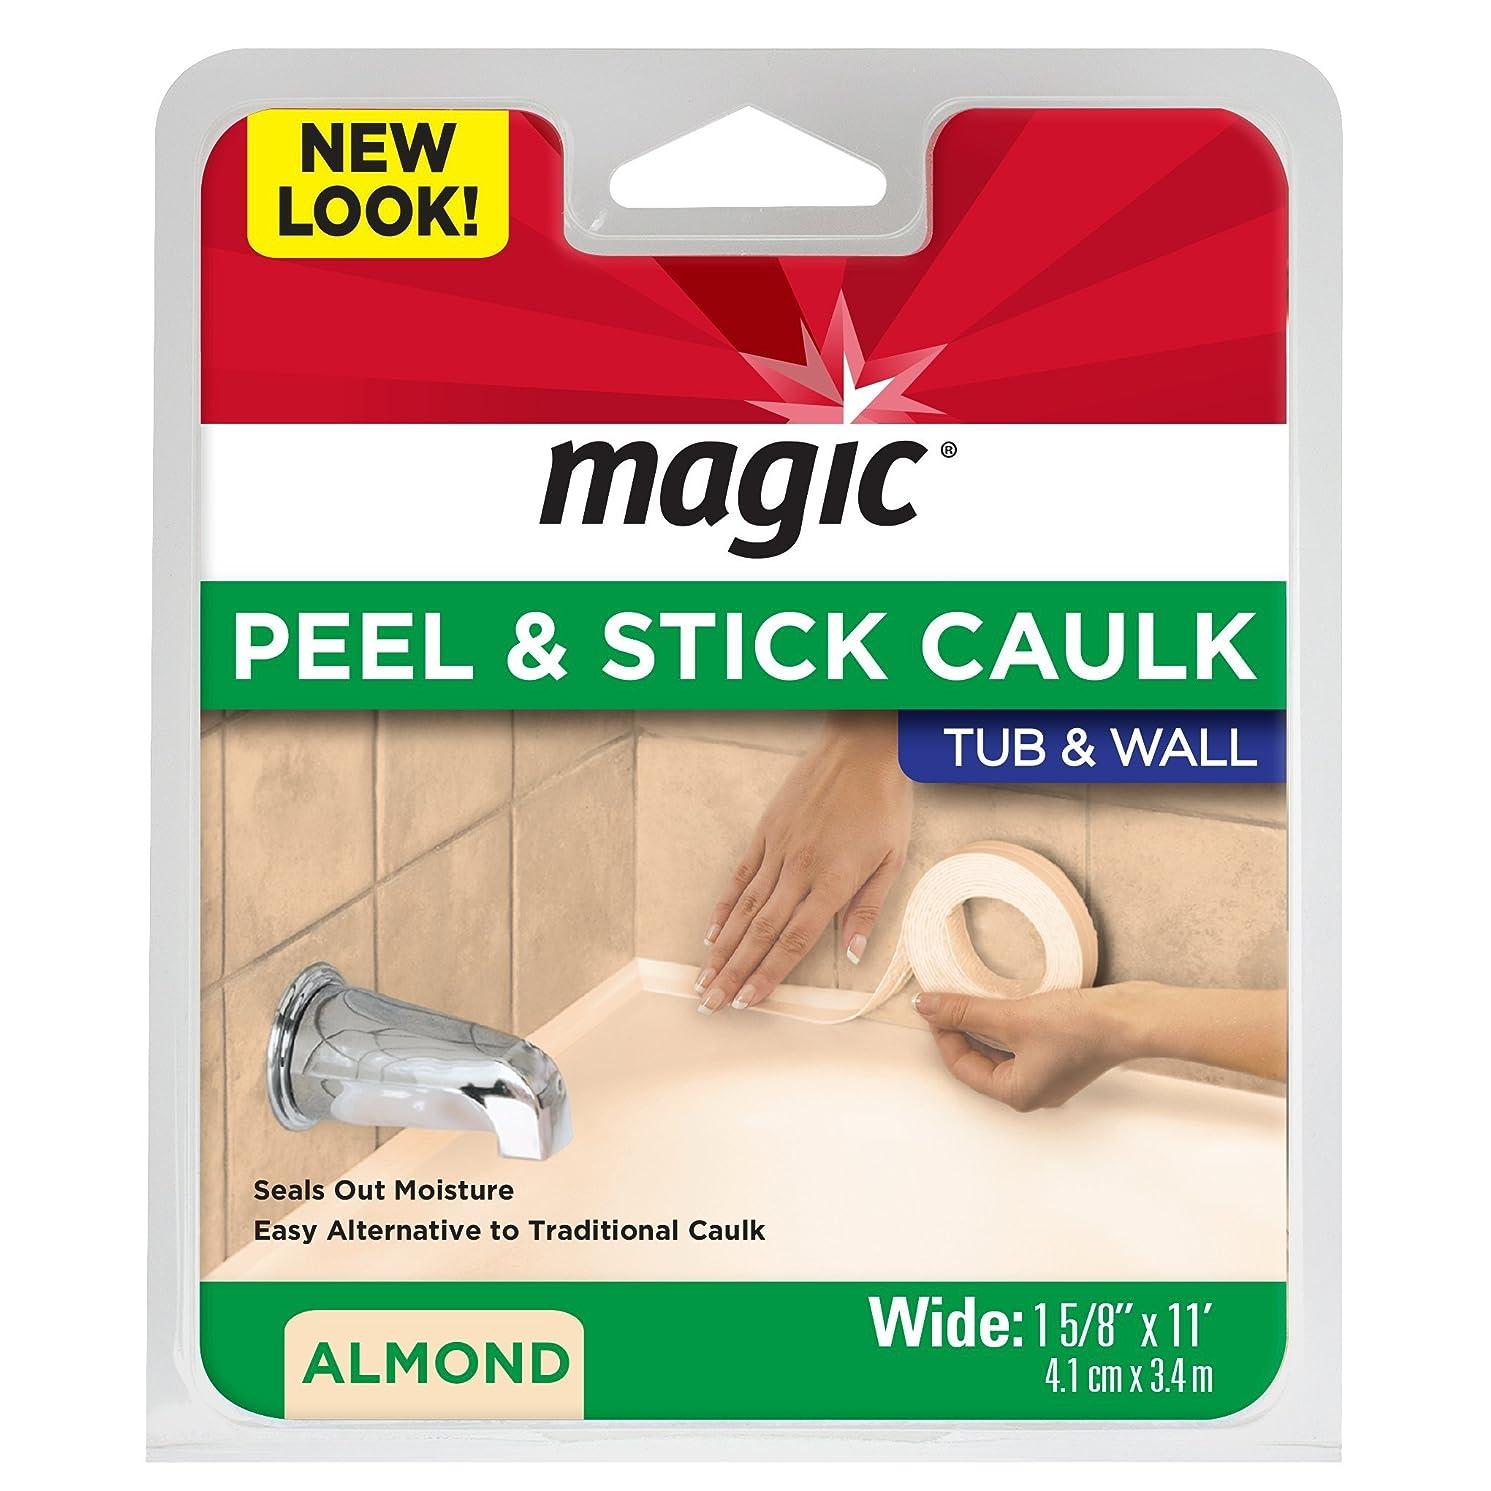 Magic Tub and Wall Peel & Caulk Strip - Create a Tight Seal Between the Bathtub and Wall to Keep Moisture Out - 1-5/8